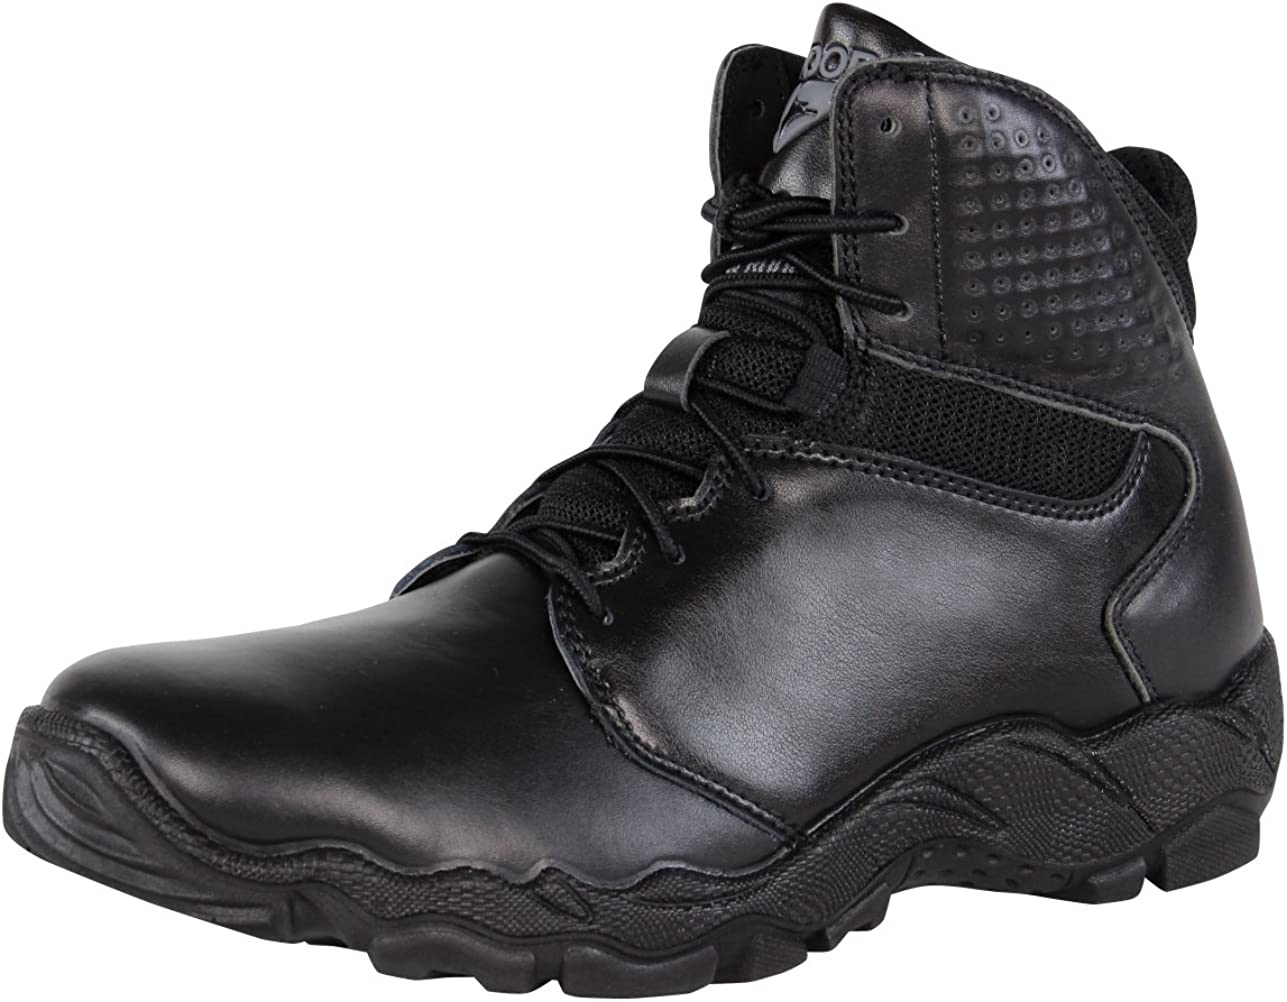 Nylon Fabric Professional Boots CONDOR Mens Keaton 6 Tactical Waterproof Leather